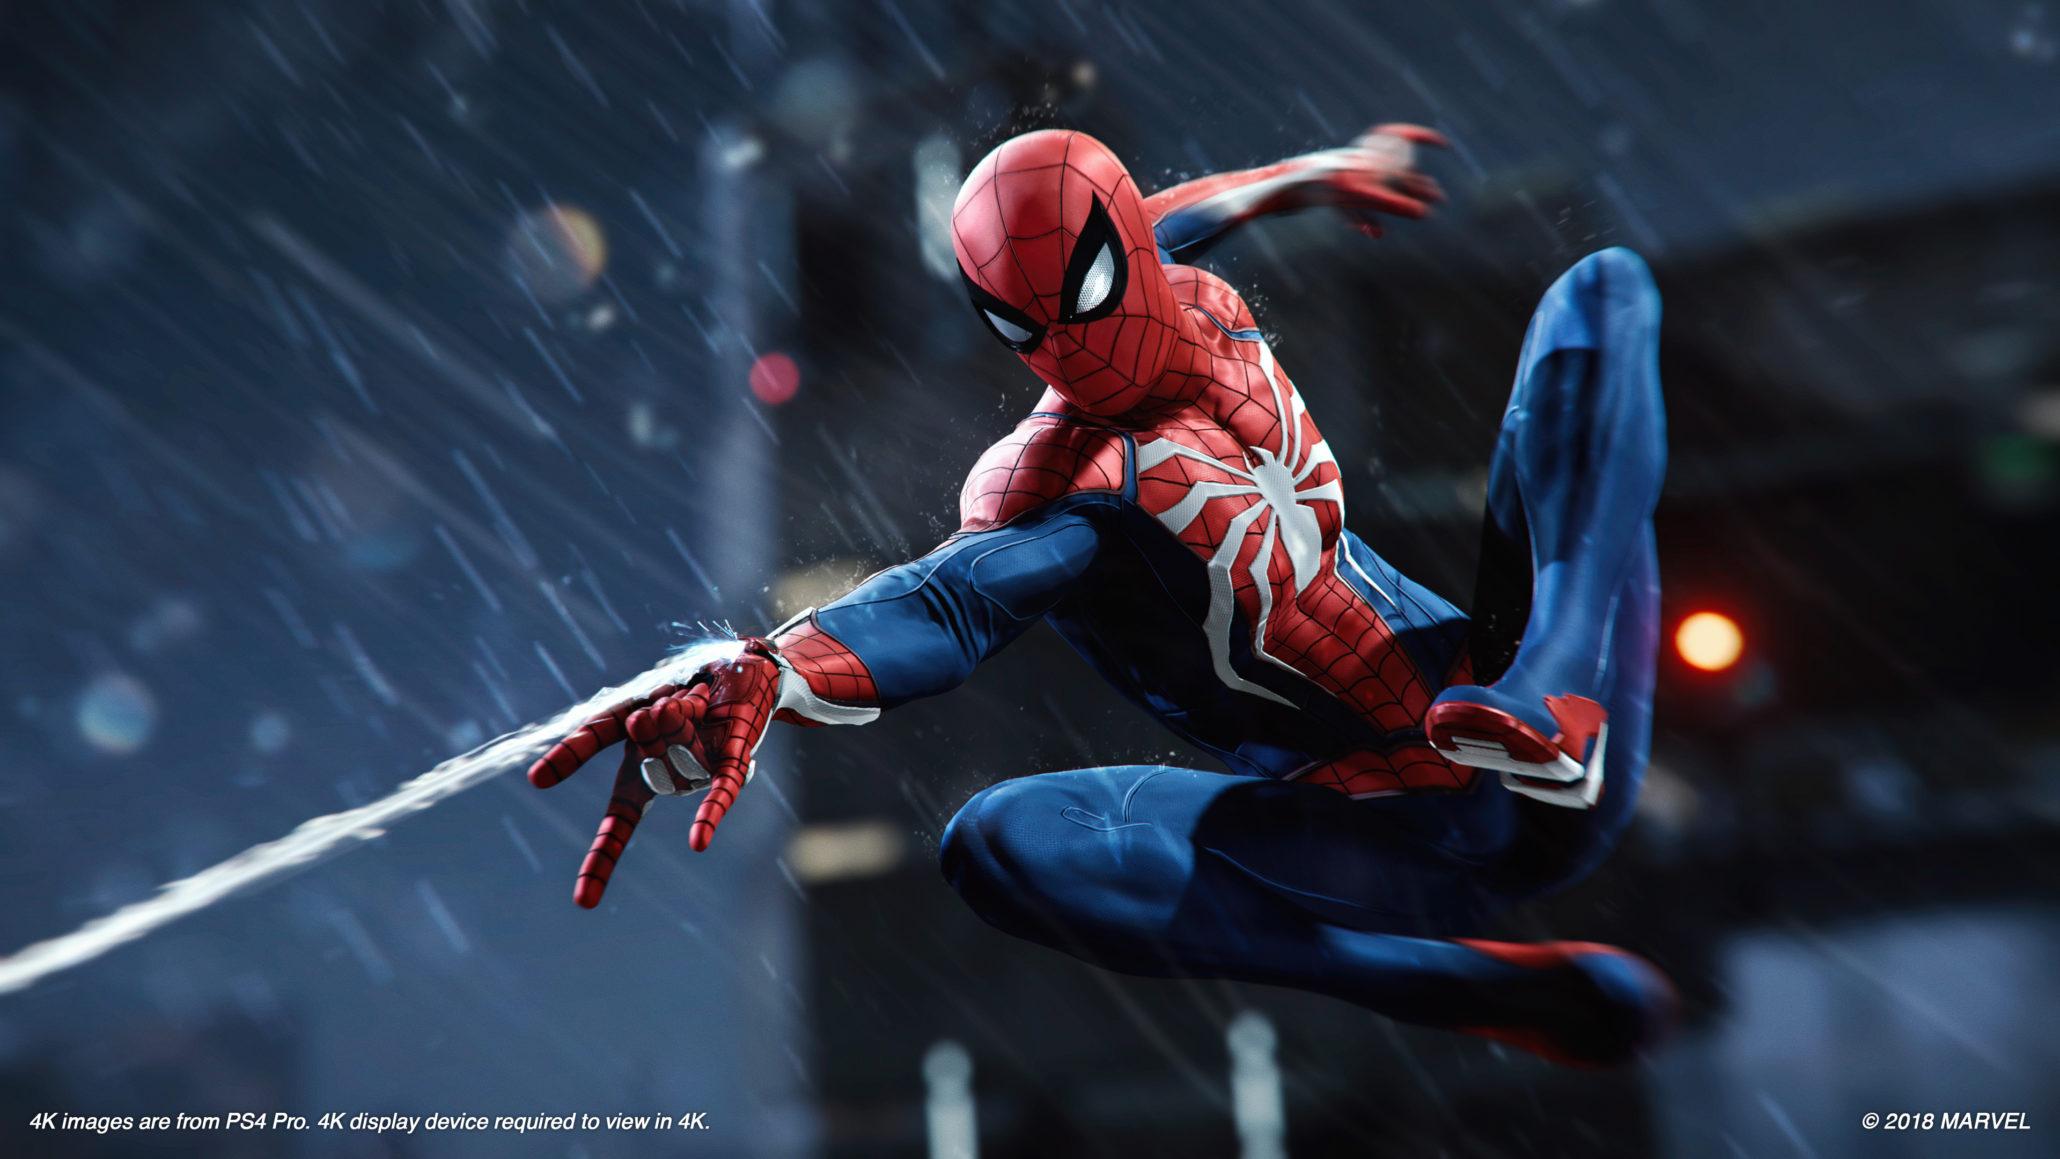 Spider-Man_Web_shooting-2060x1159